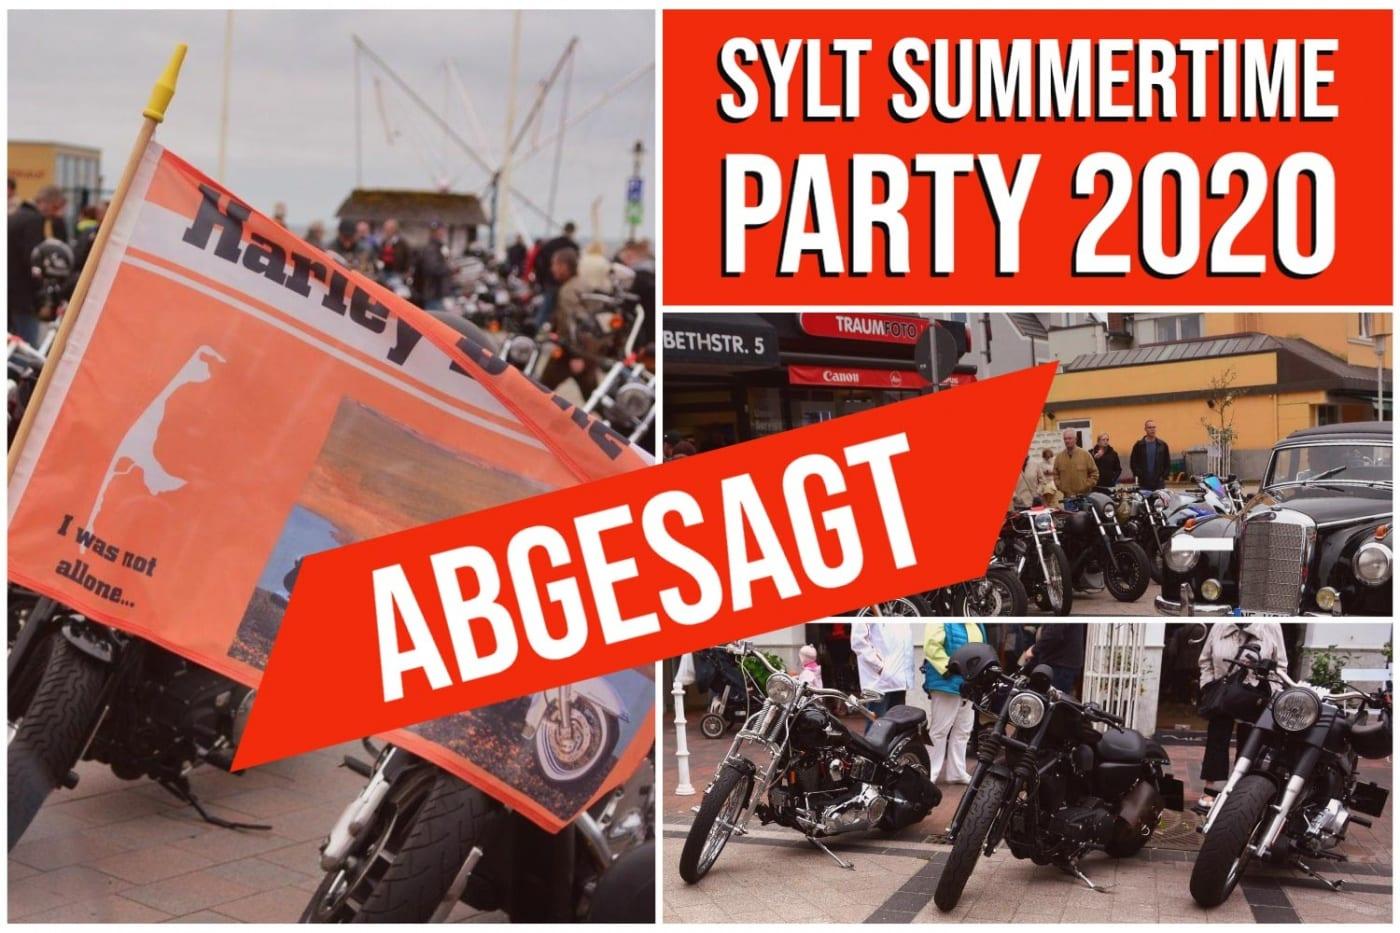 ABGESAGT - Sylt Summertime Party 2020